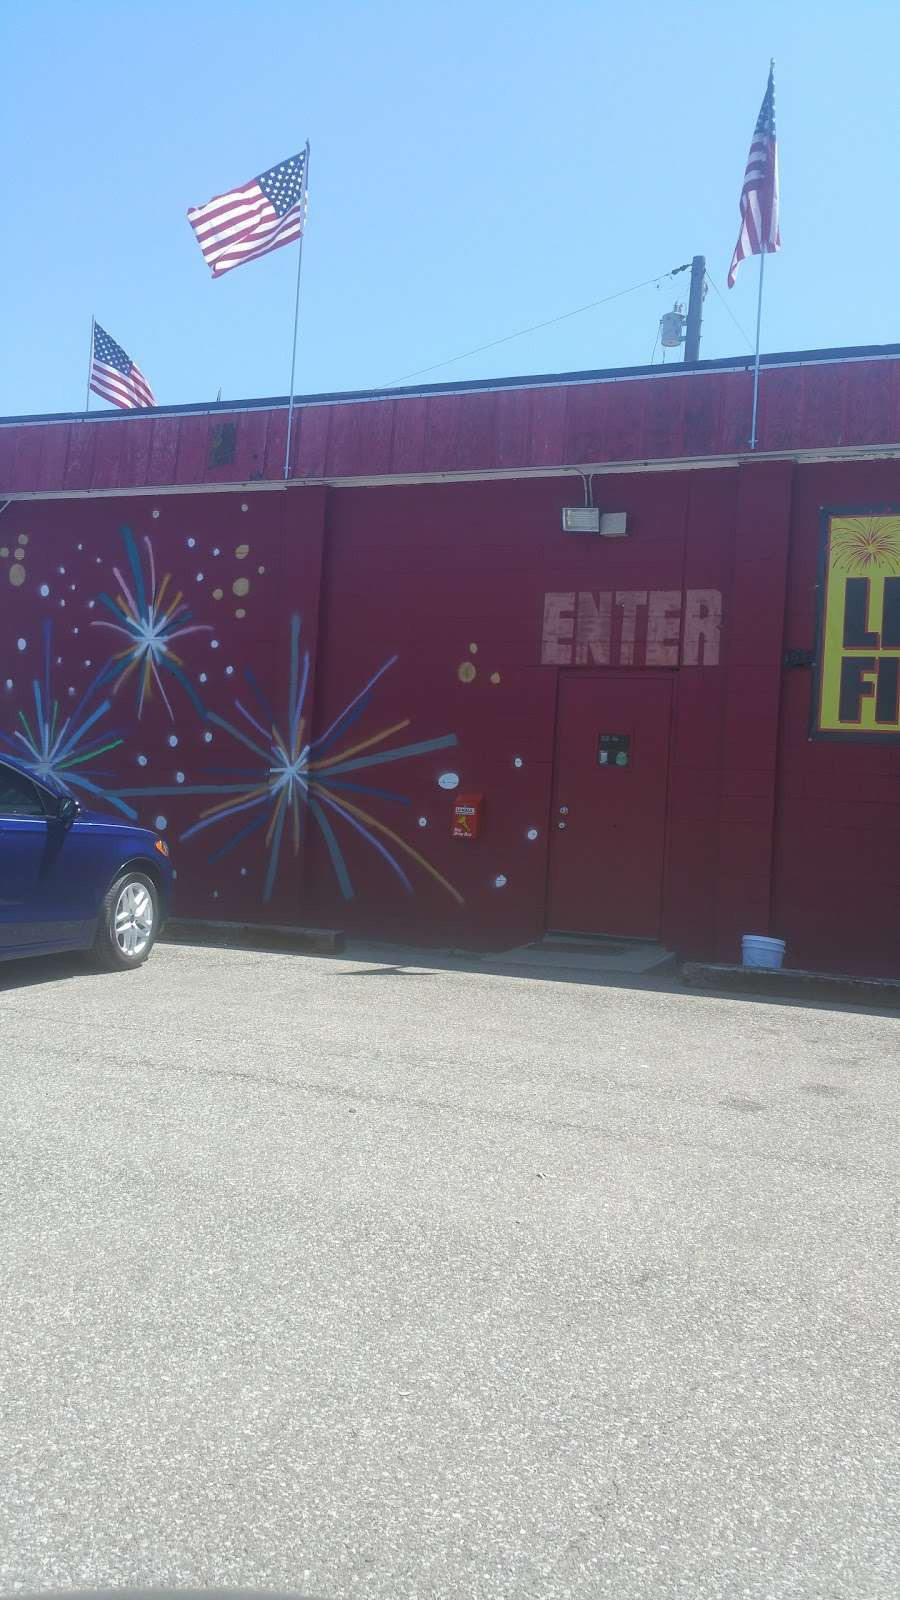 Lightning Fireworks - store    Photo 7 of 9   Address: 9401 Melton Rd, Gary, IN 46403, USA   Phone: (312) 502-2987